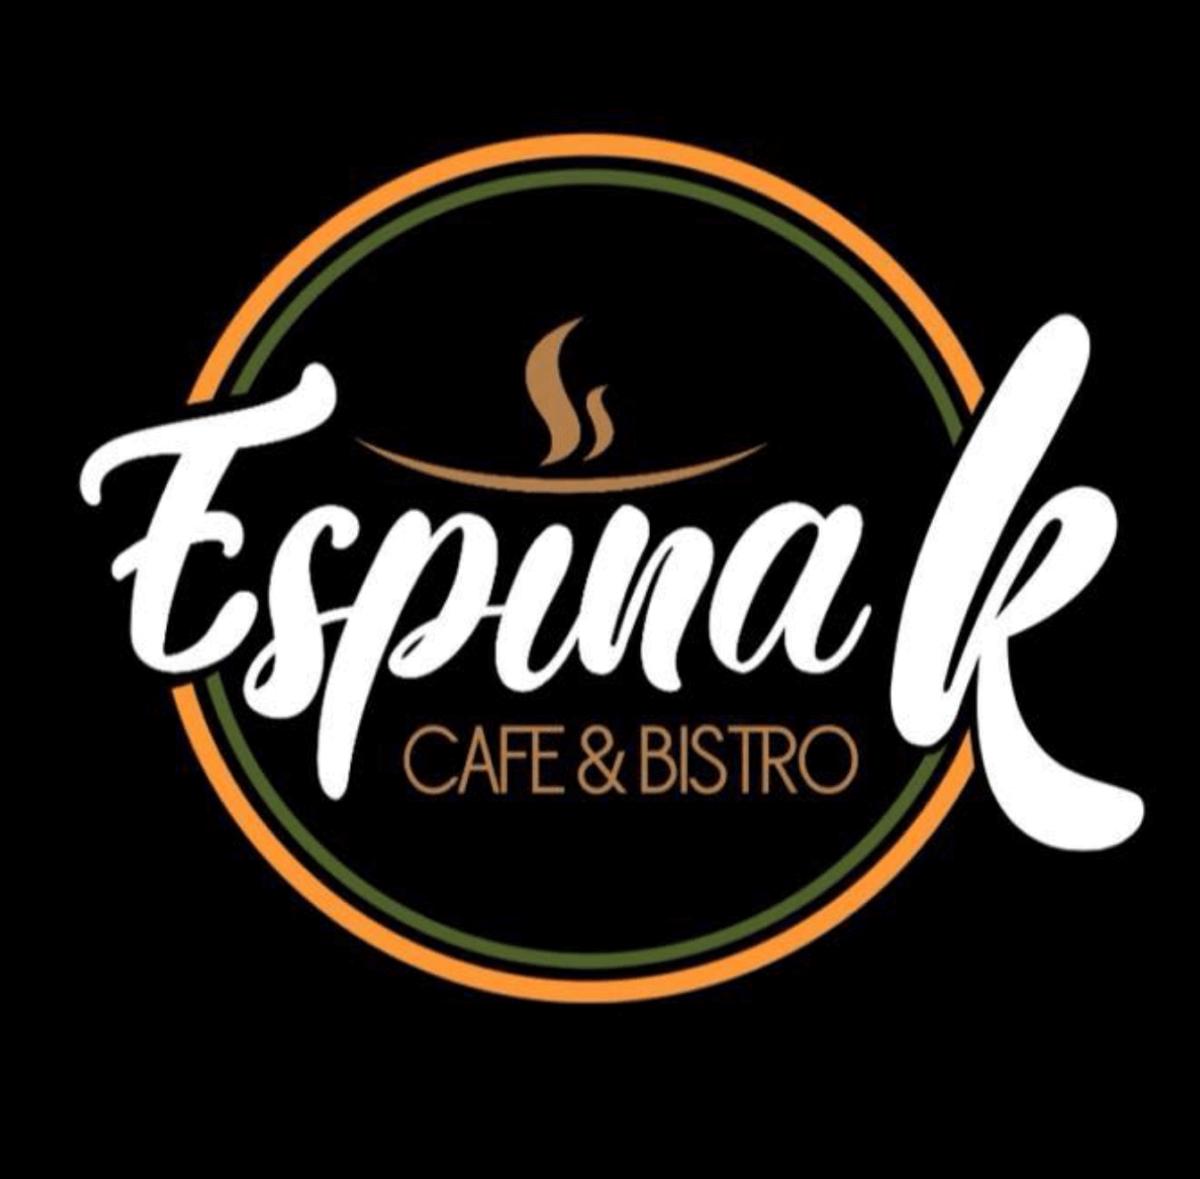 EspinaK Cafe & Bistro Logo